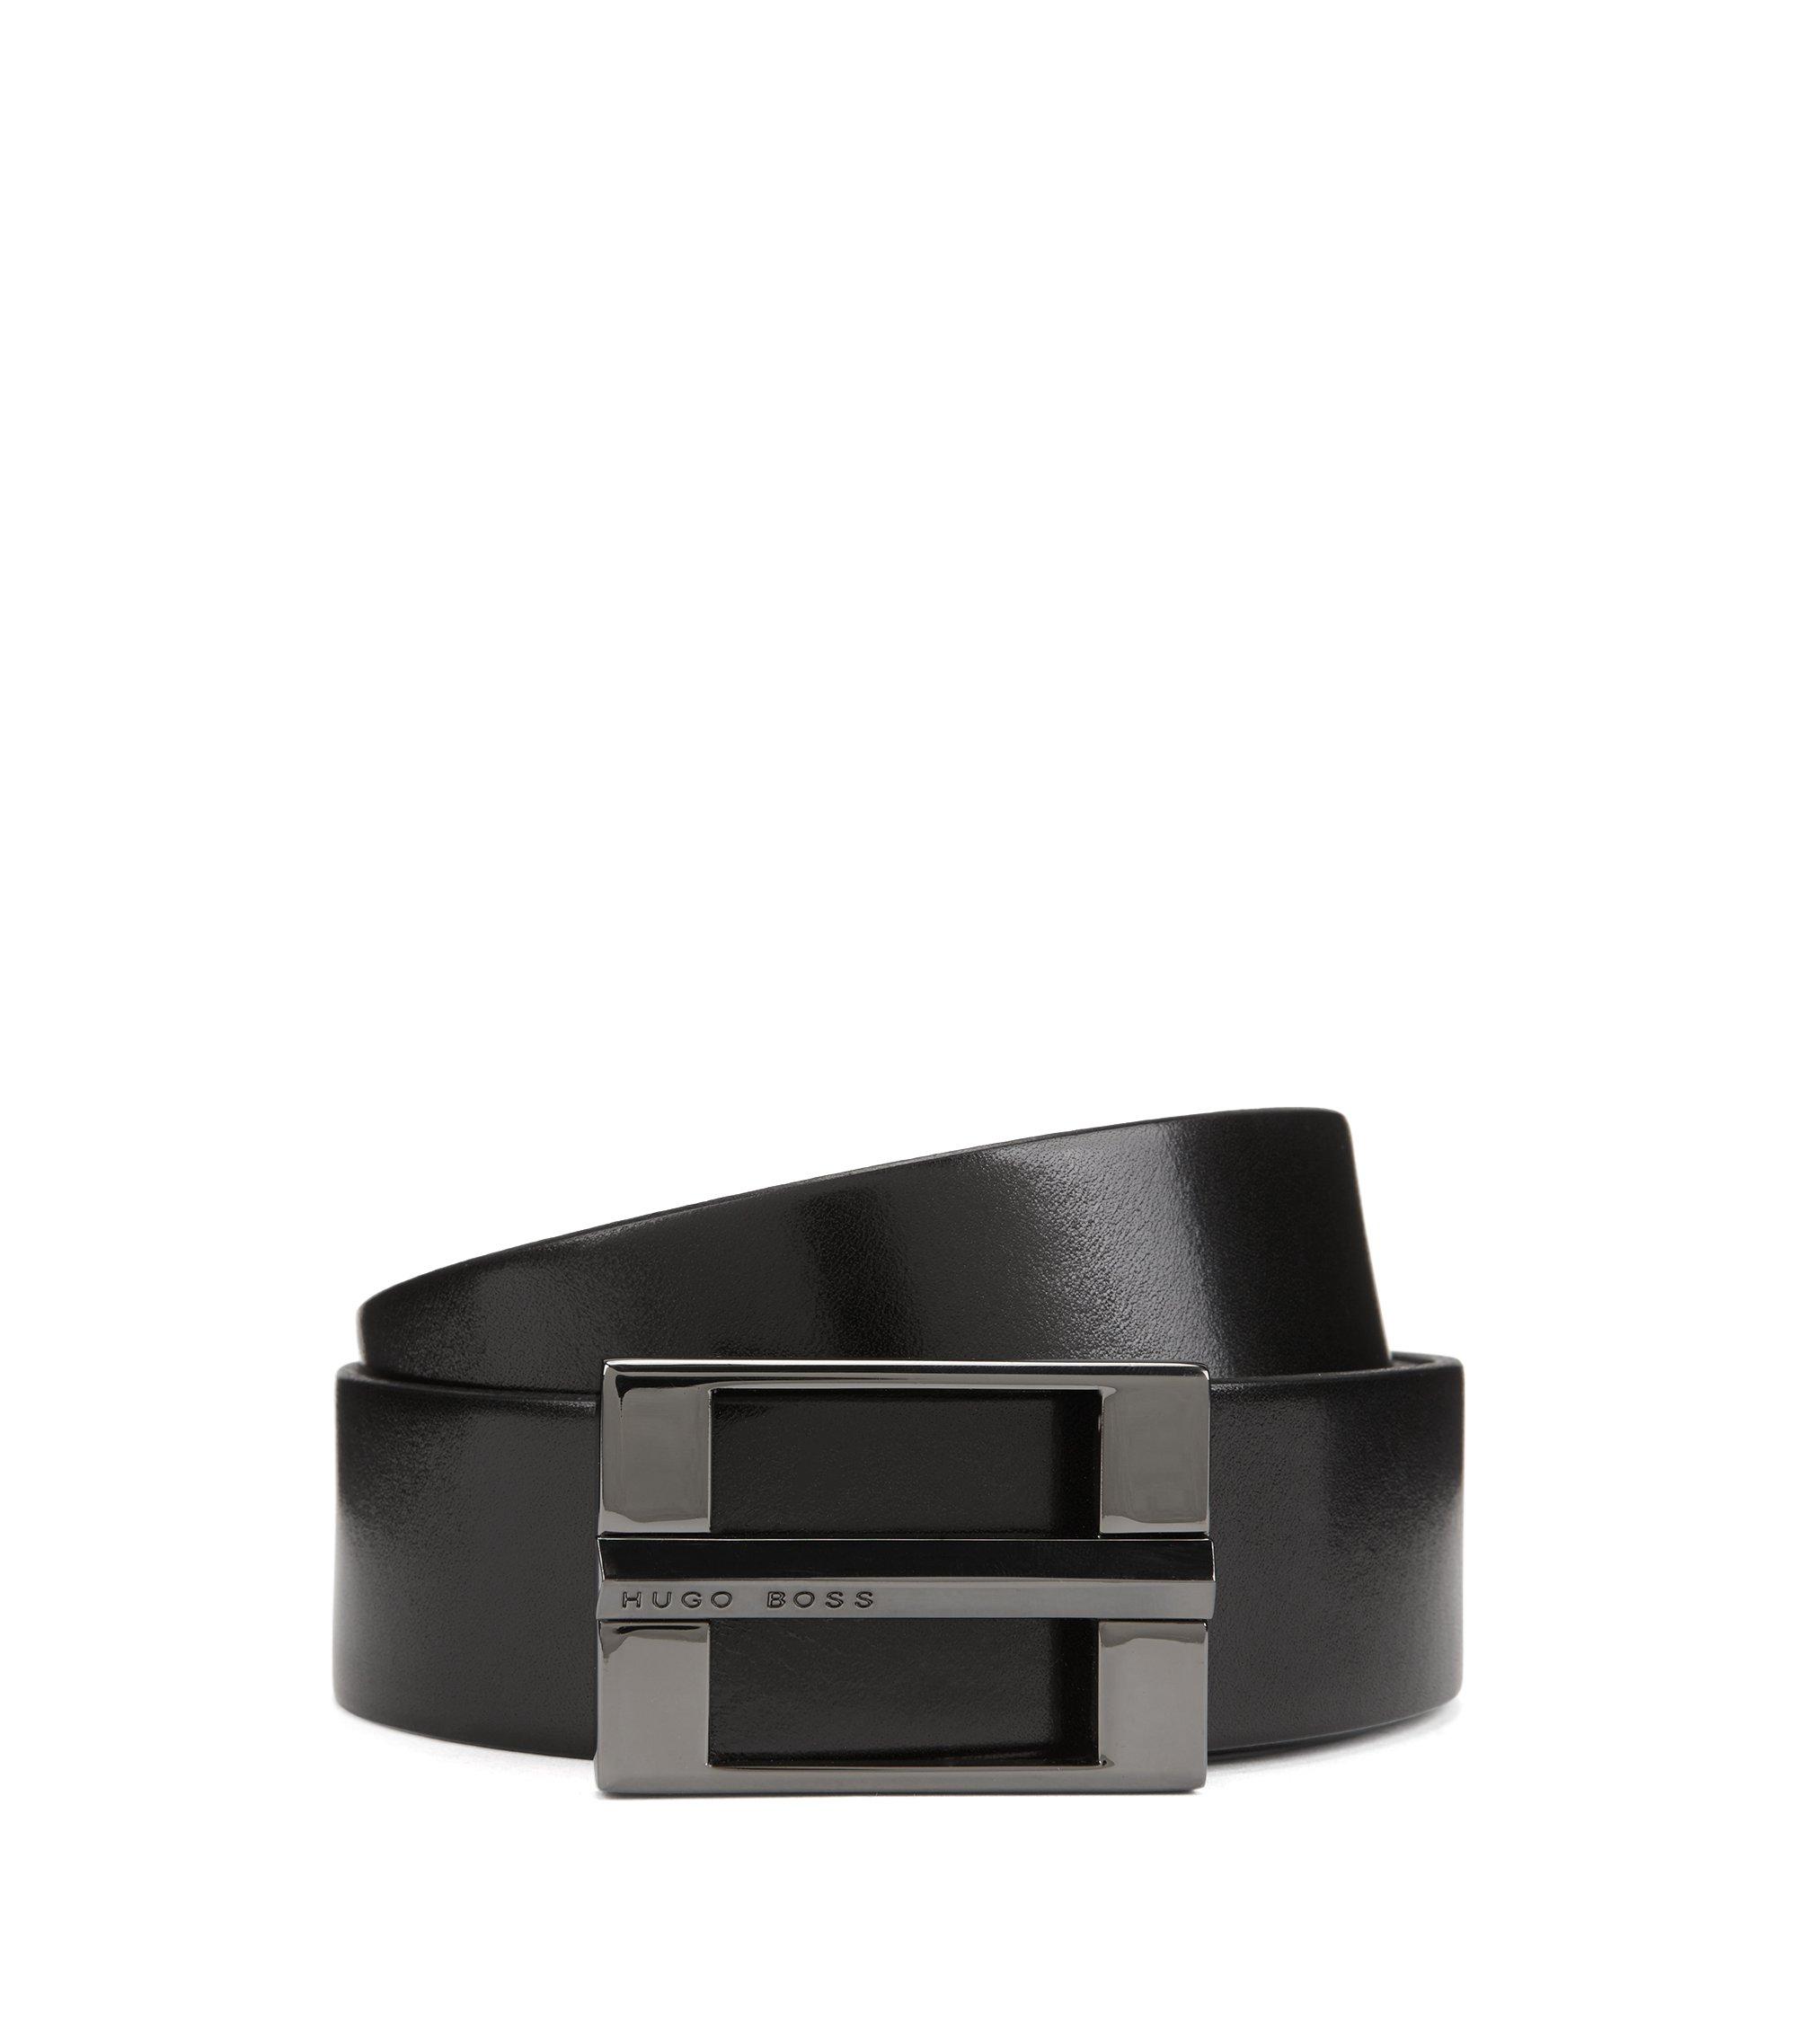 Leather belt with signature gunmetal hardware, Black